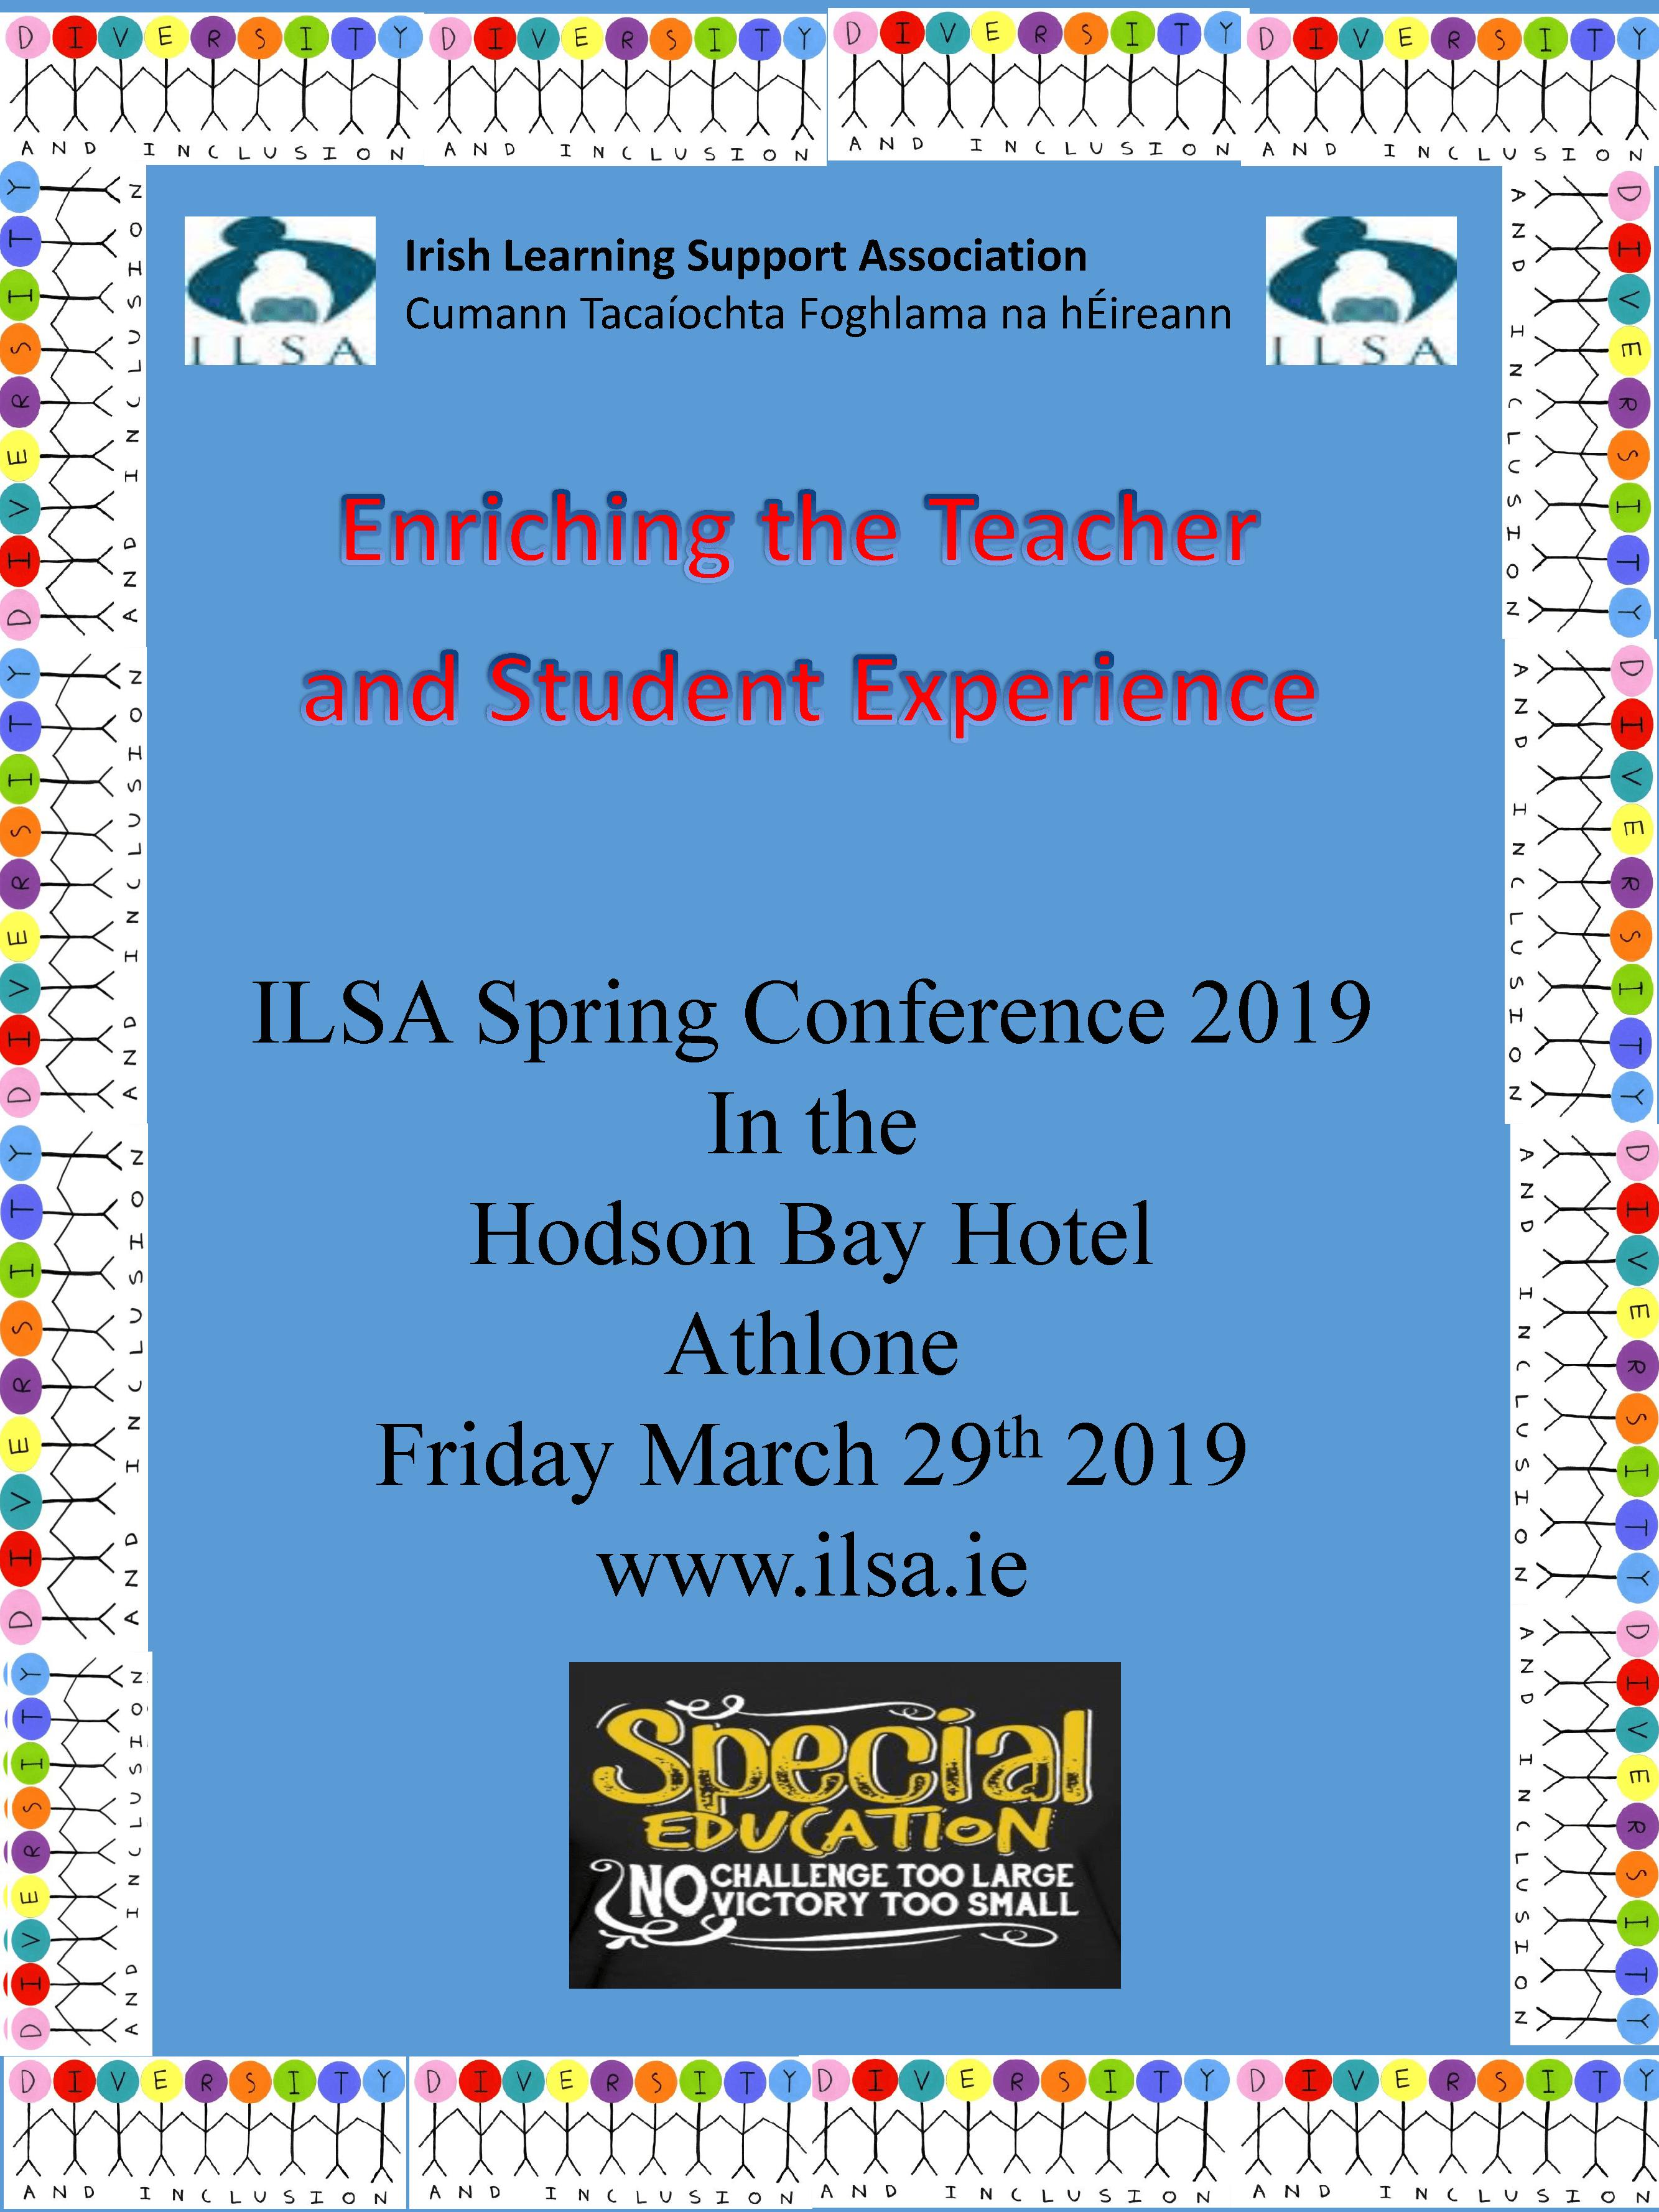 2019 Irish Learning Support Association Poster